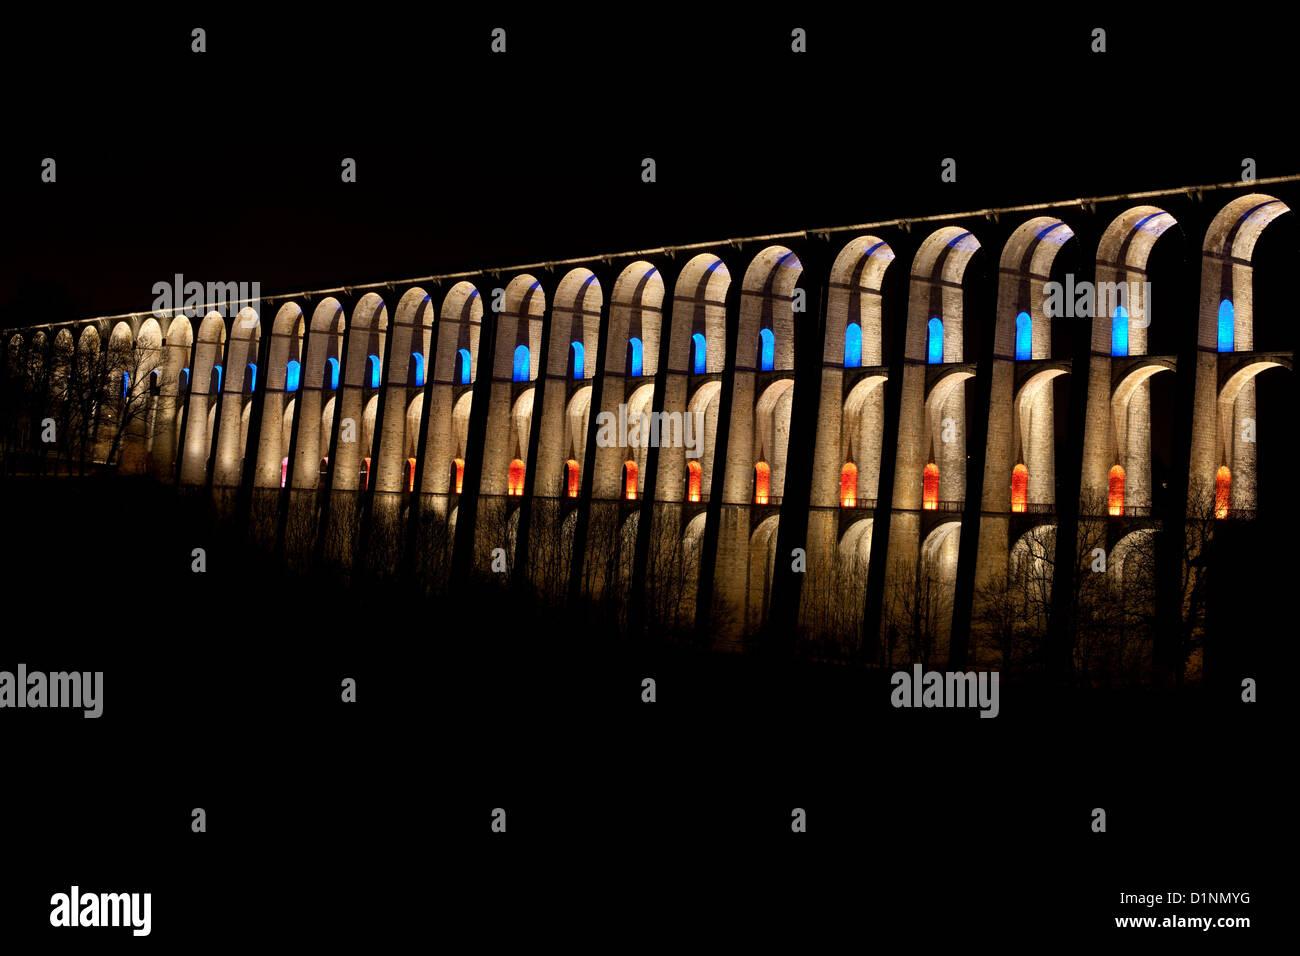 LED LIGHTS ILLUMINATING THE CHAUMONT VIADUCT. Historic railroad viaduct (built 1857) on the Paris-Basel line. Haute - Stock Image